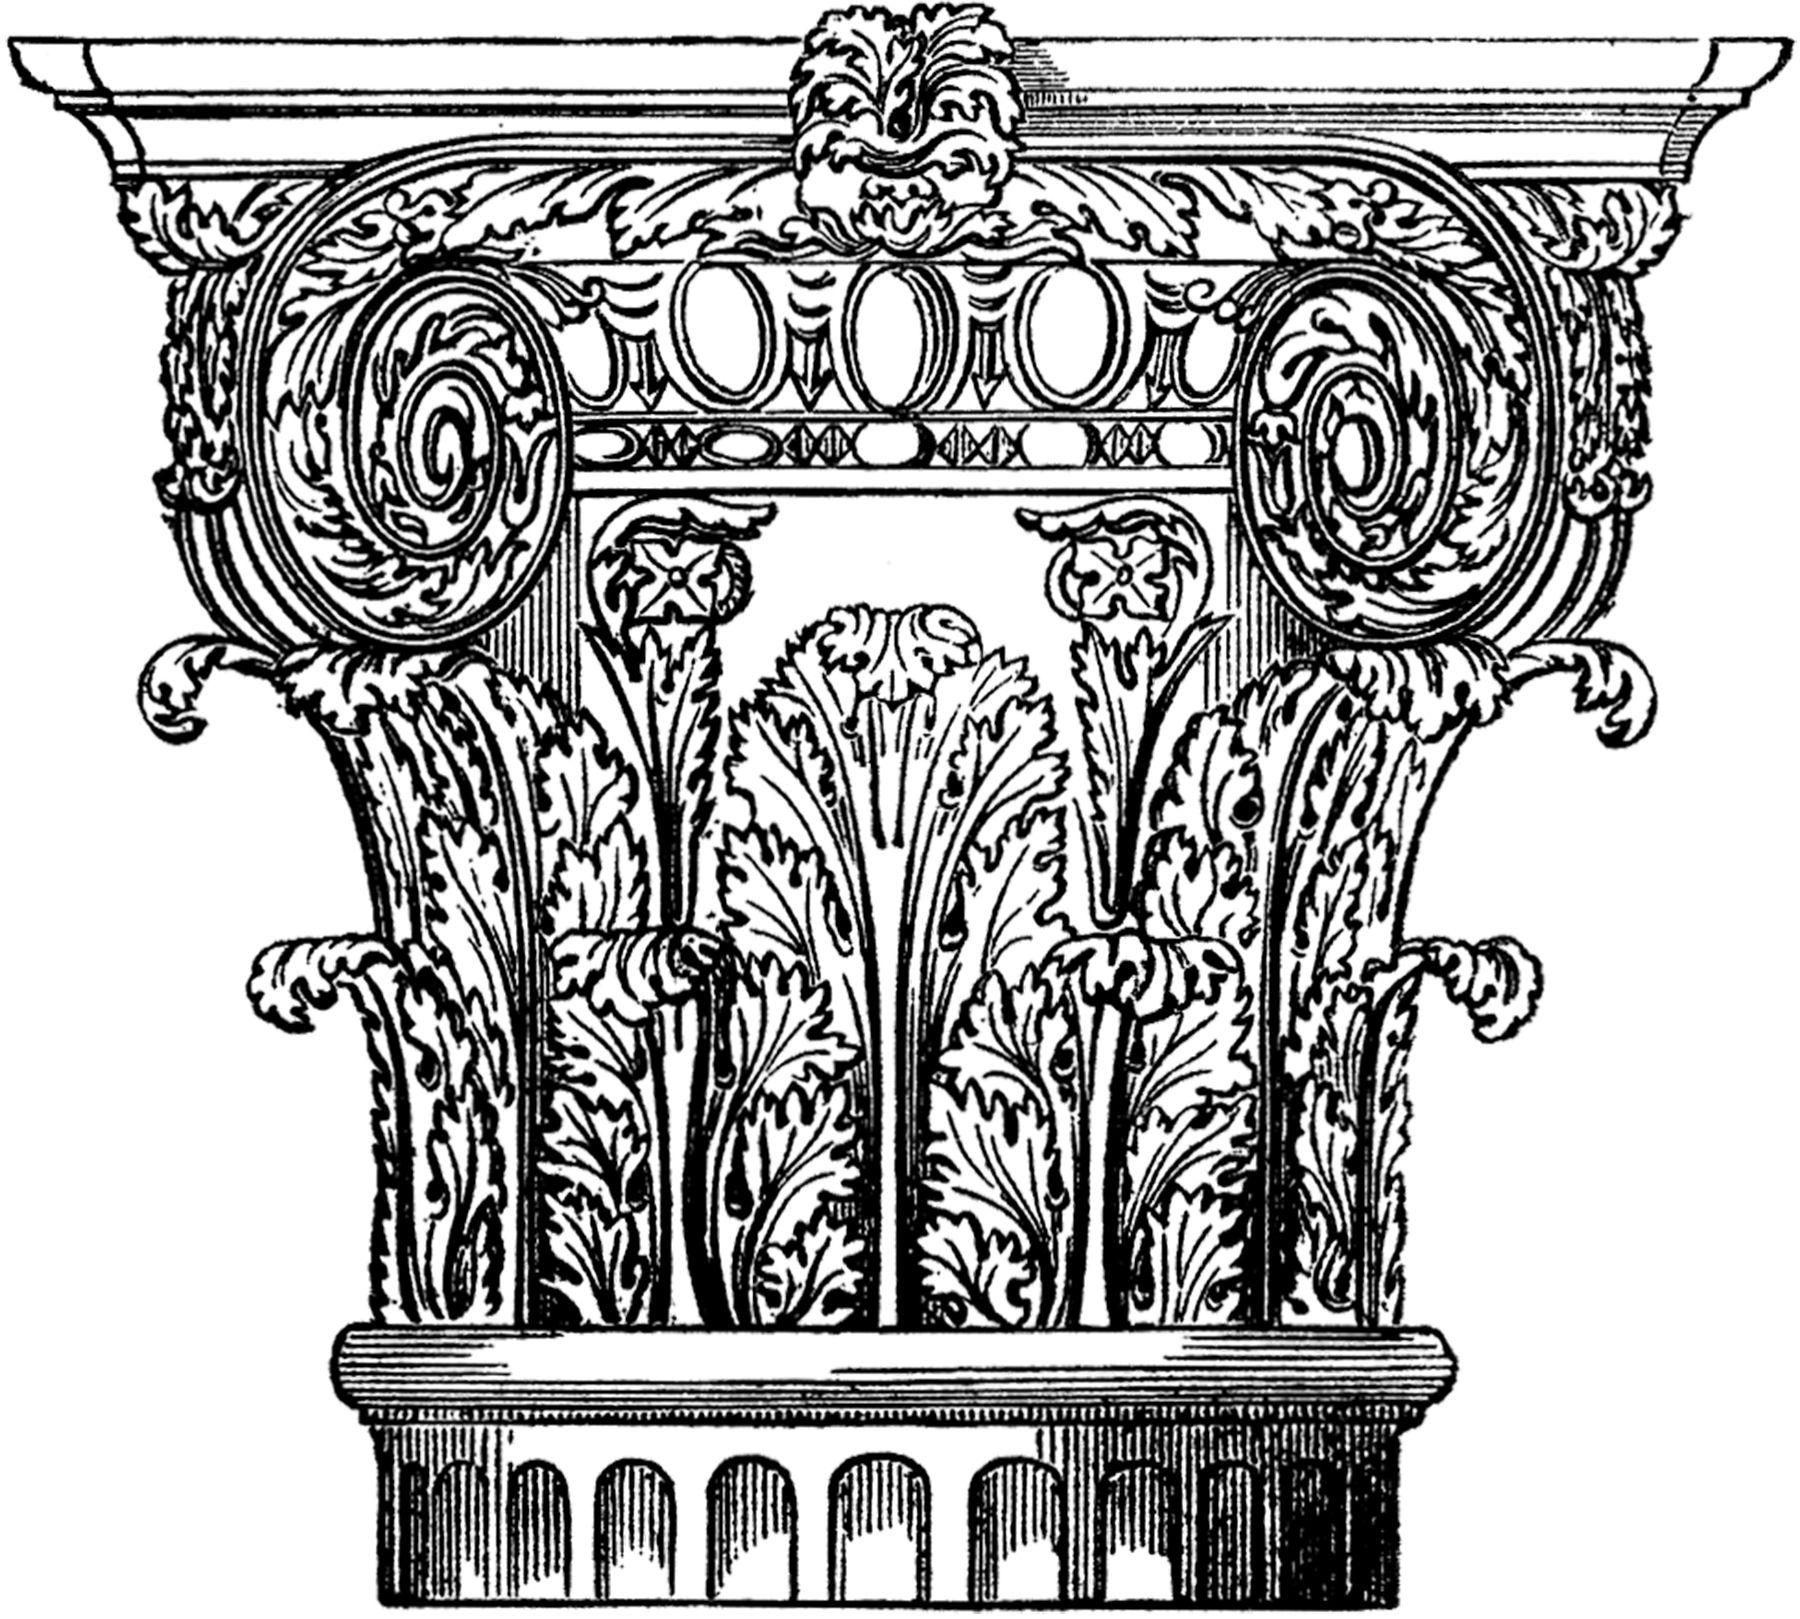 1800x1619 Architectural Column Image Architectural Columns, Columns